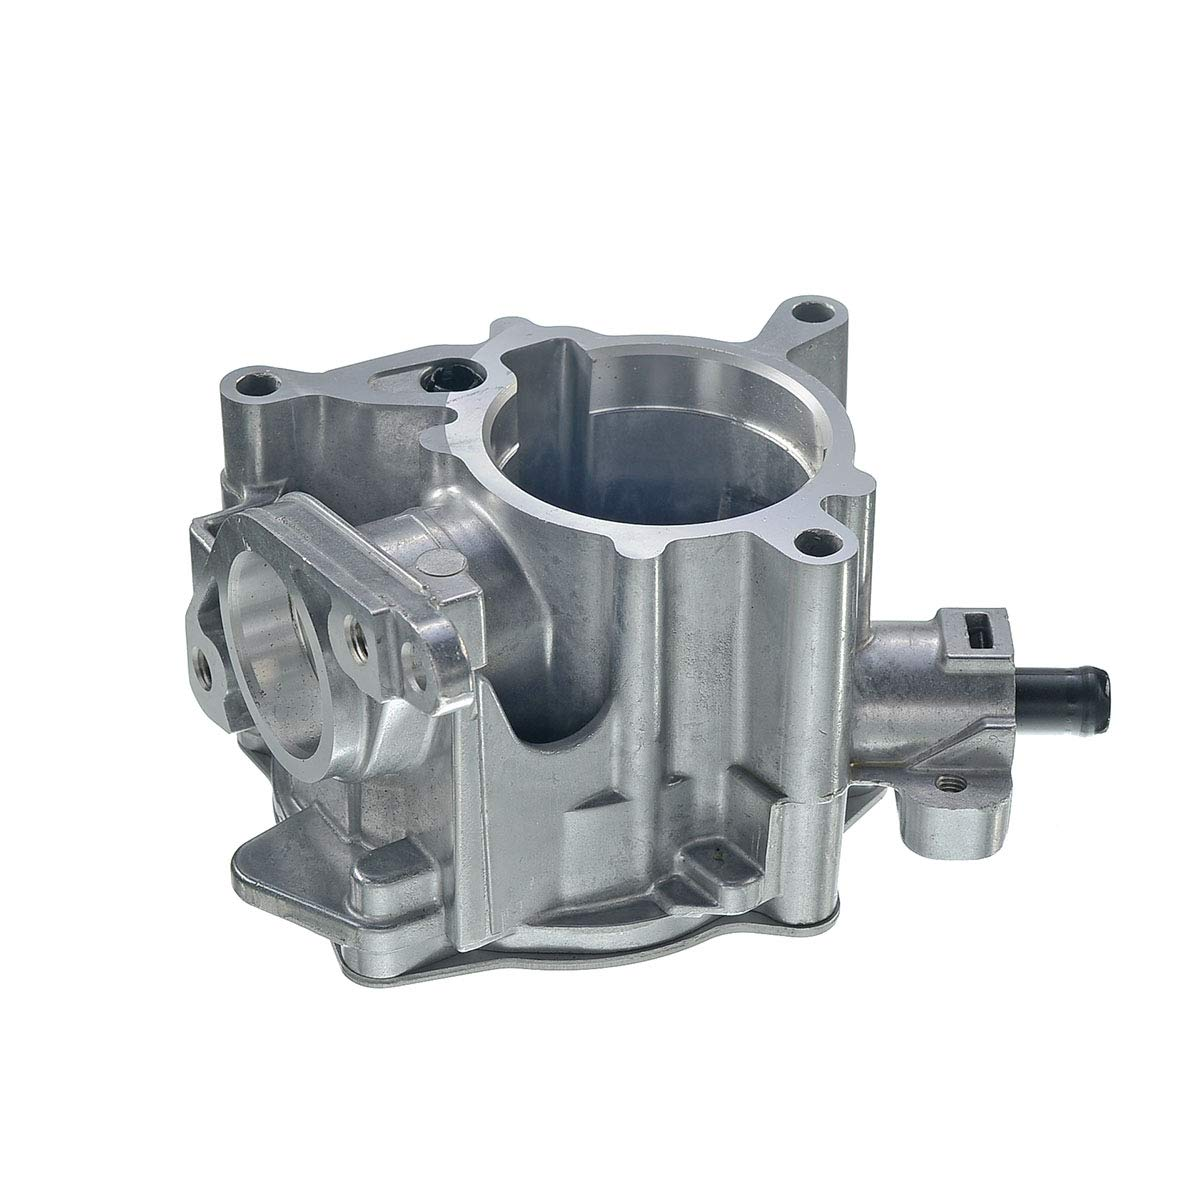 A-Premium Brake Vacuum Pump for Audi A4 A4 Quattro 2009-2016 A5 A6 Quattro Q5 TT Quattro l4 2.0L